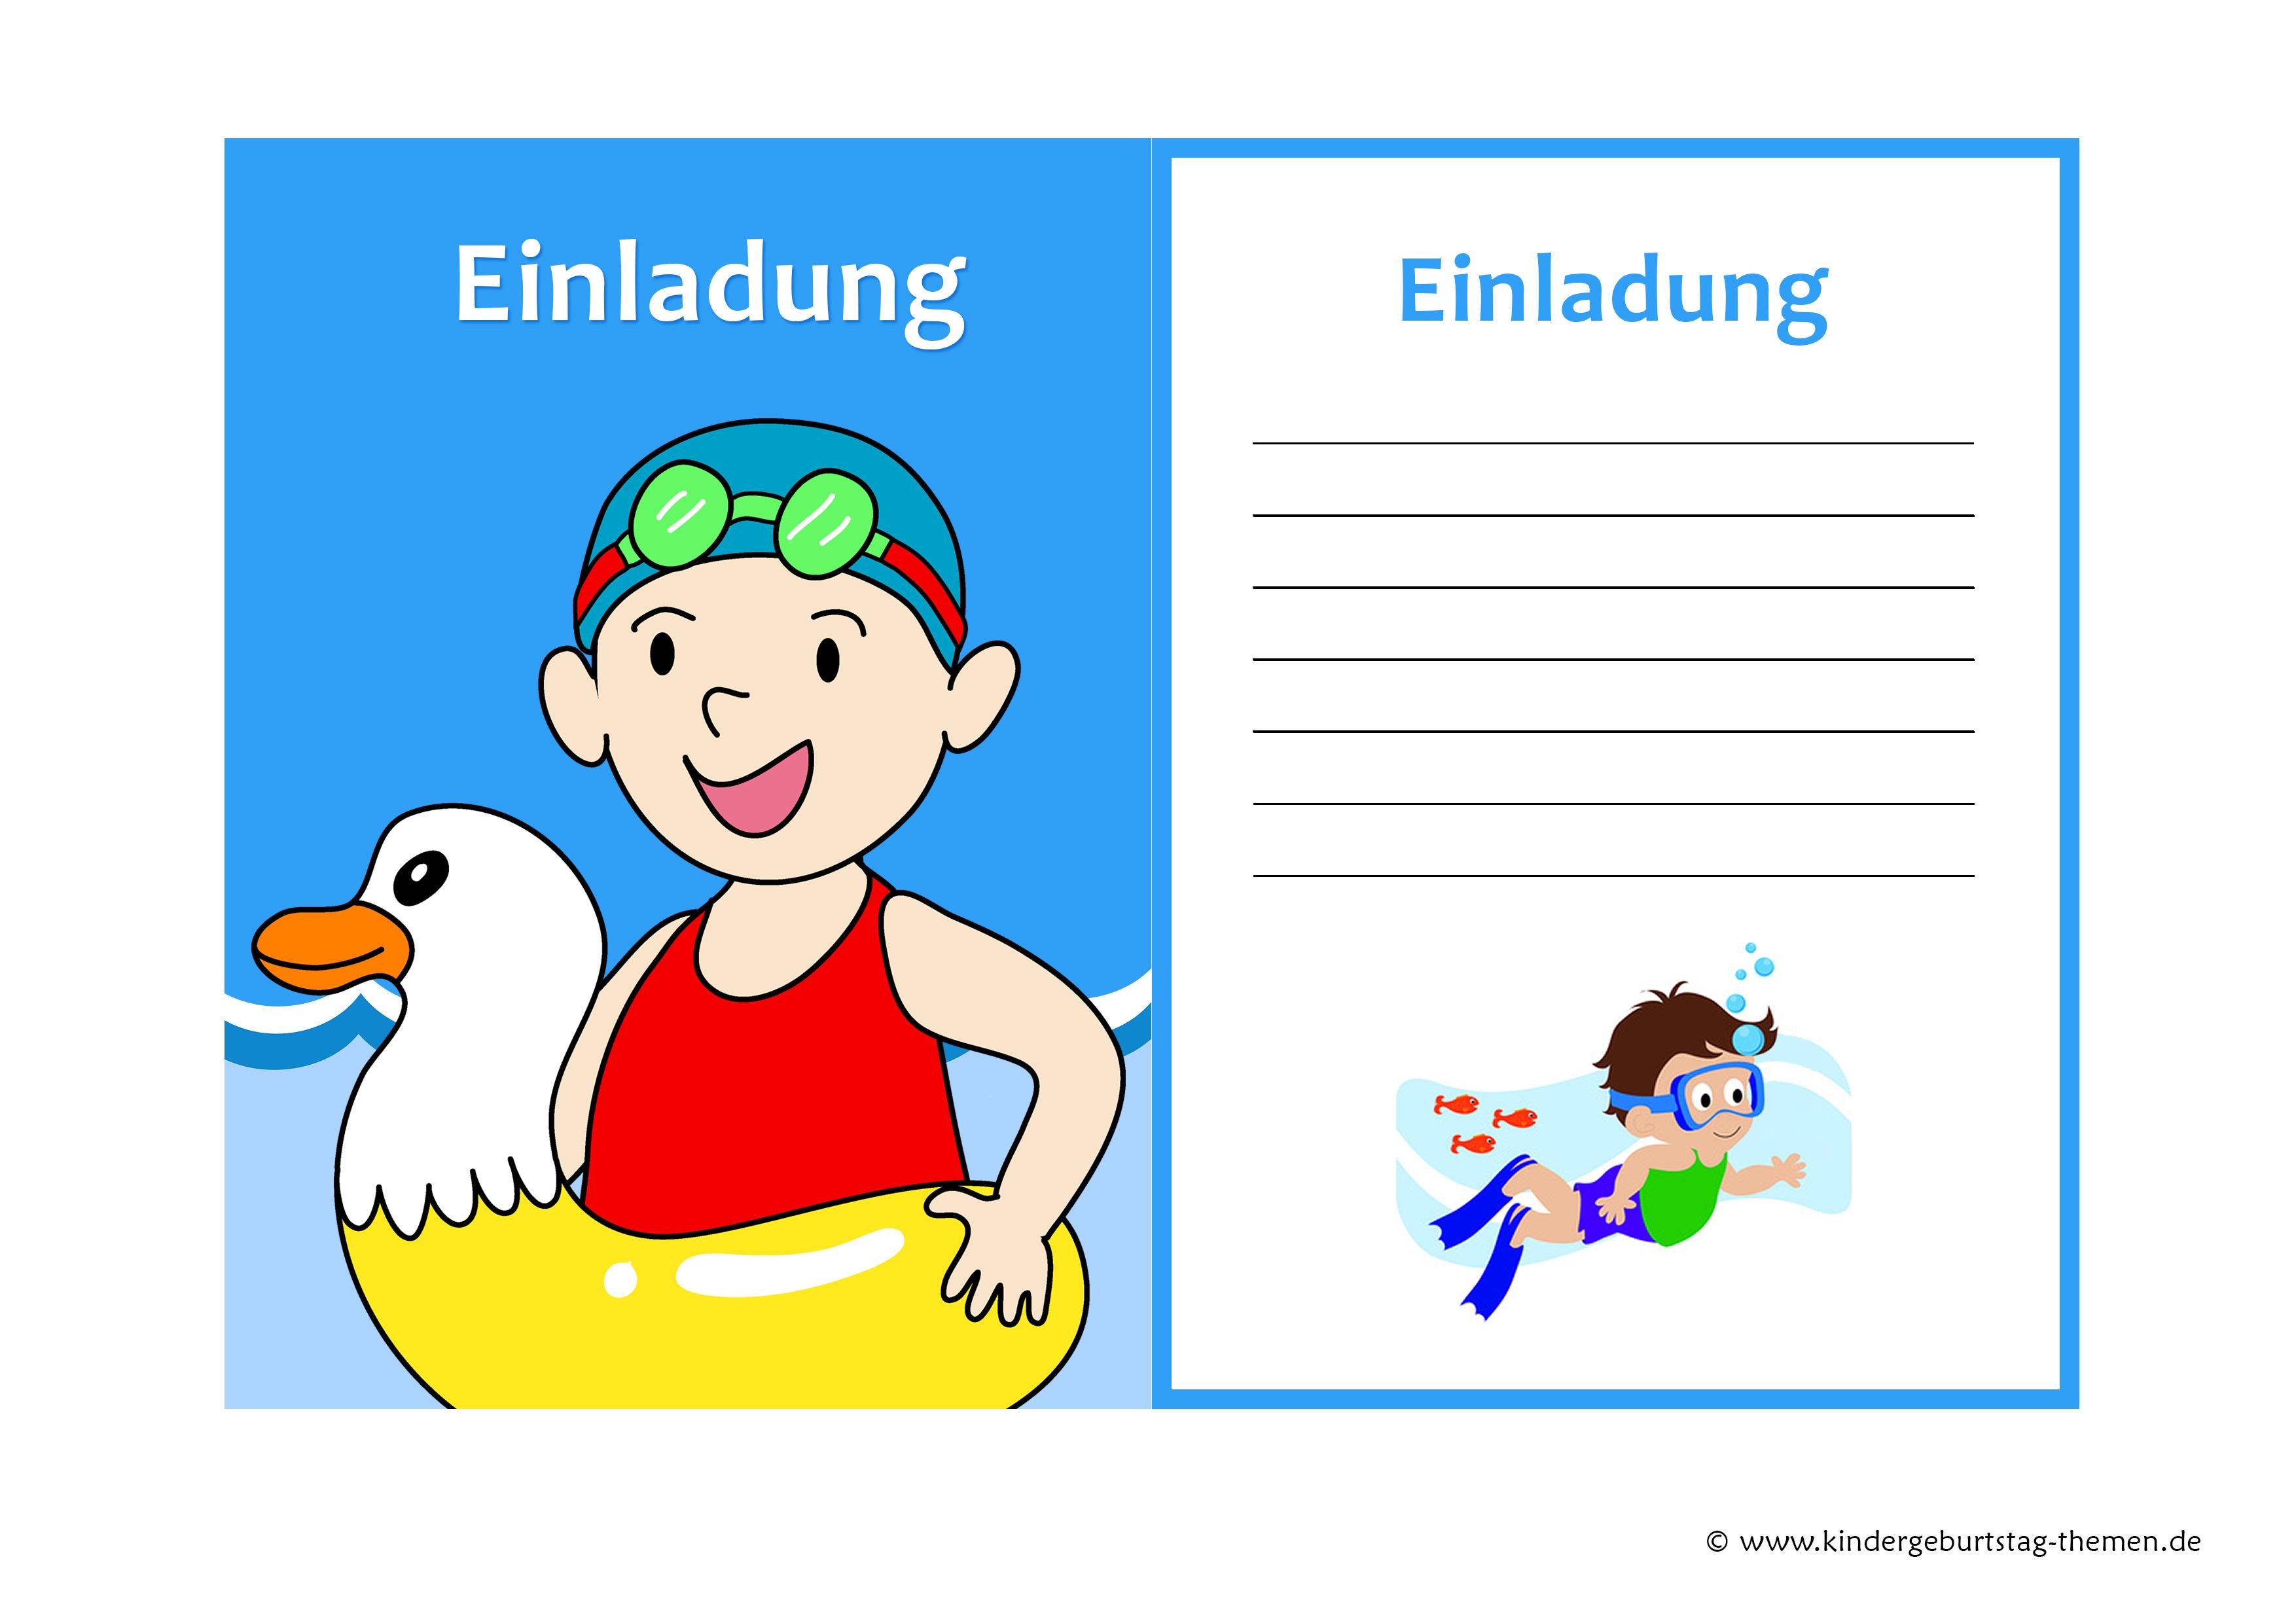 geburtstag einladung kind : geburtstag einladung kindergeburtstag, Einladung